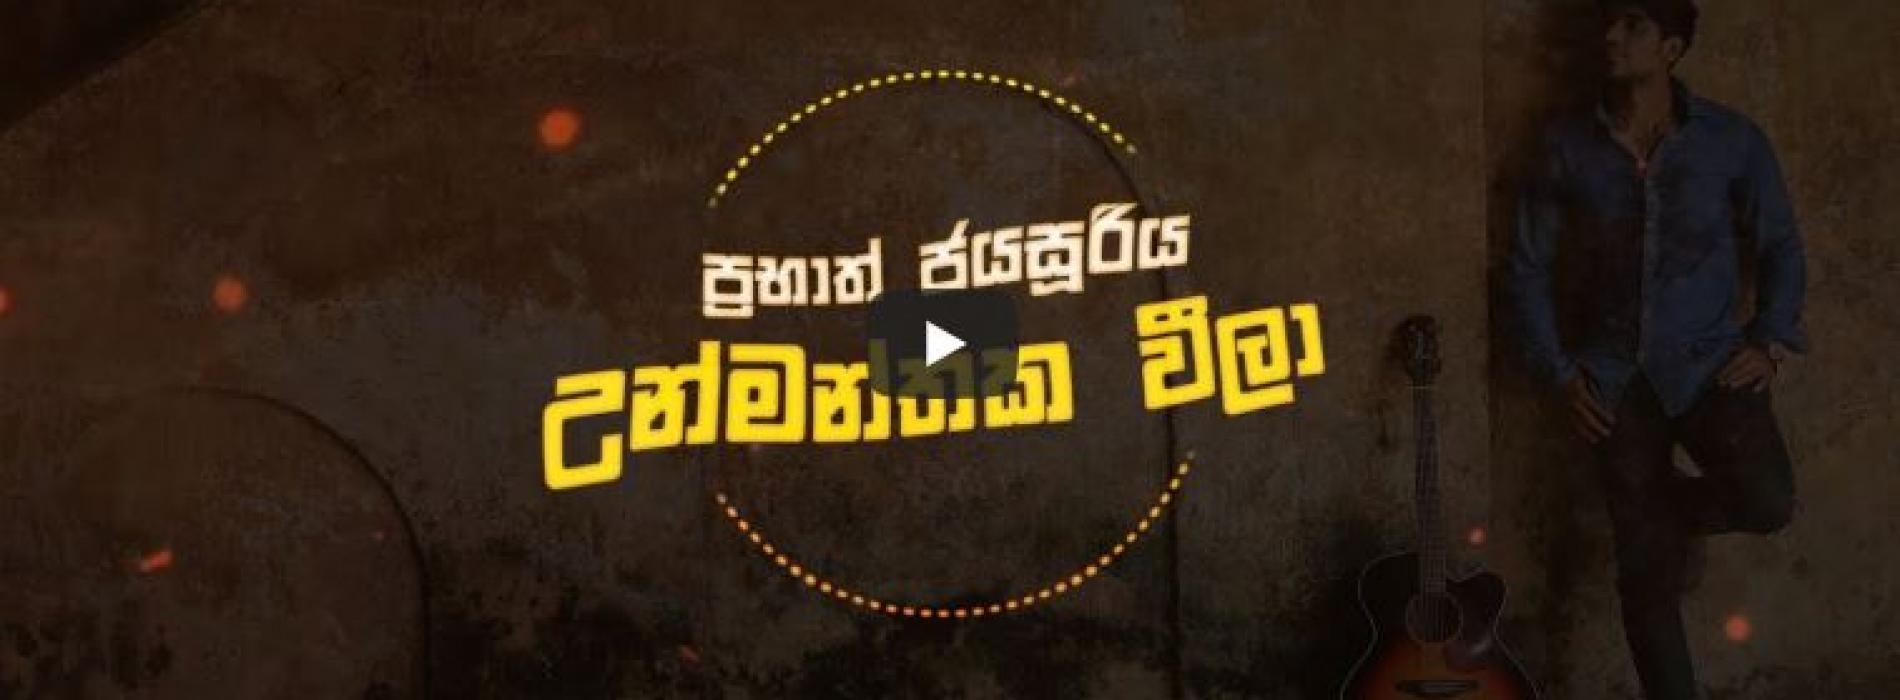 Prabath Jayasooriya – Unmanthaka Weela [Official Lyric Video]